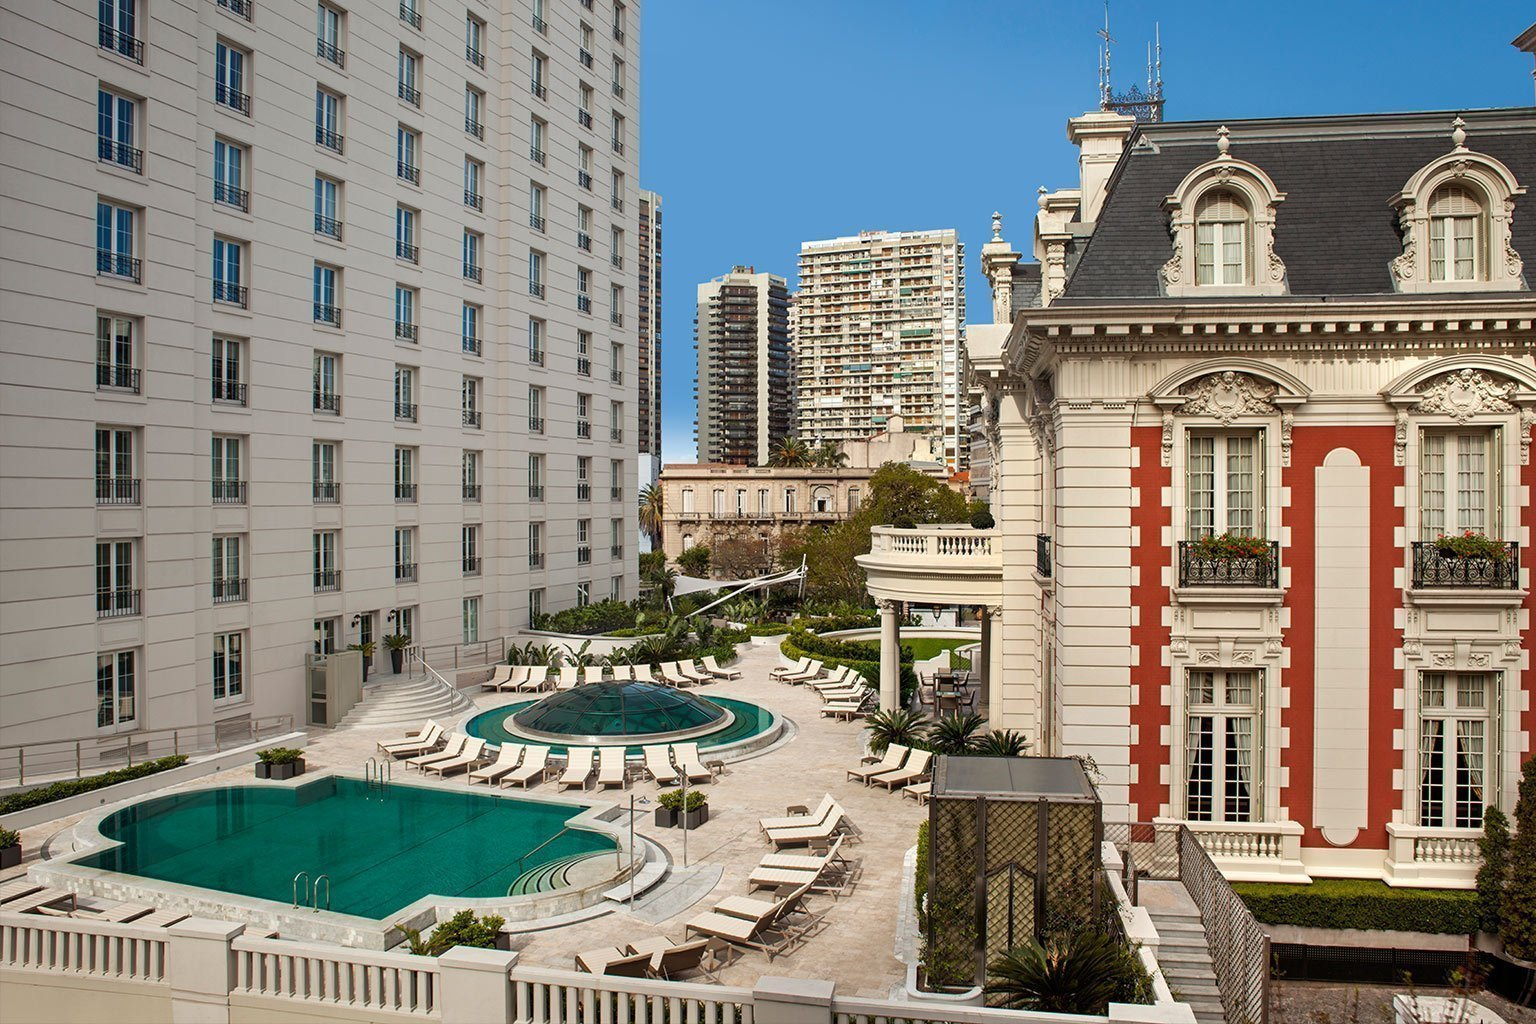 Four seasons buenos aires luxushotels bei designreisen for Ce design buenos aires